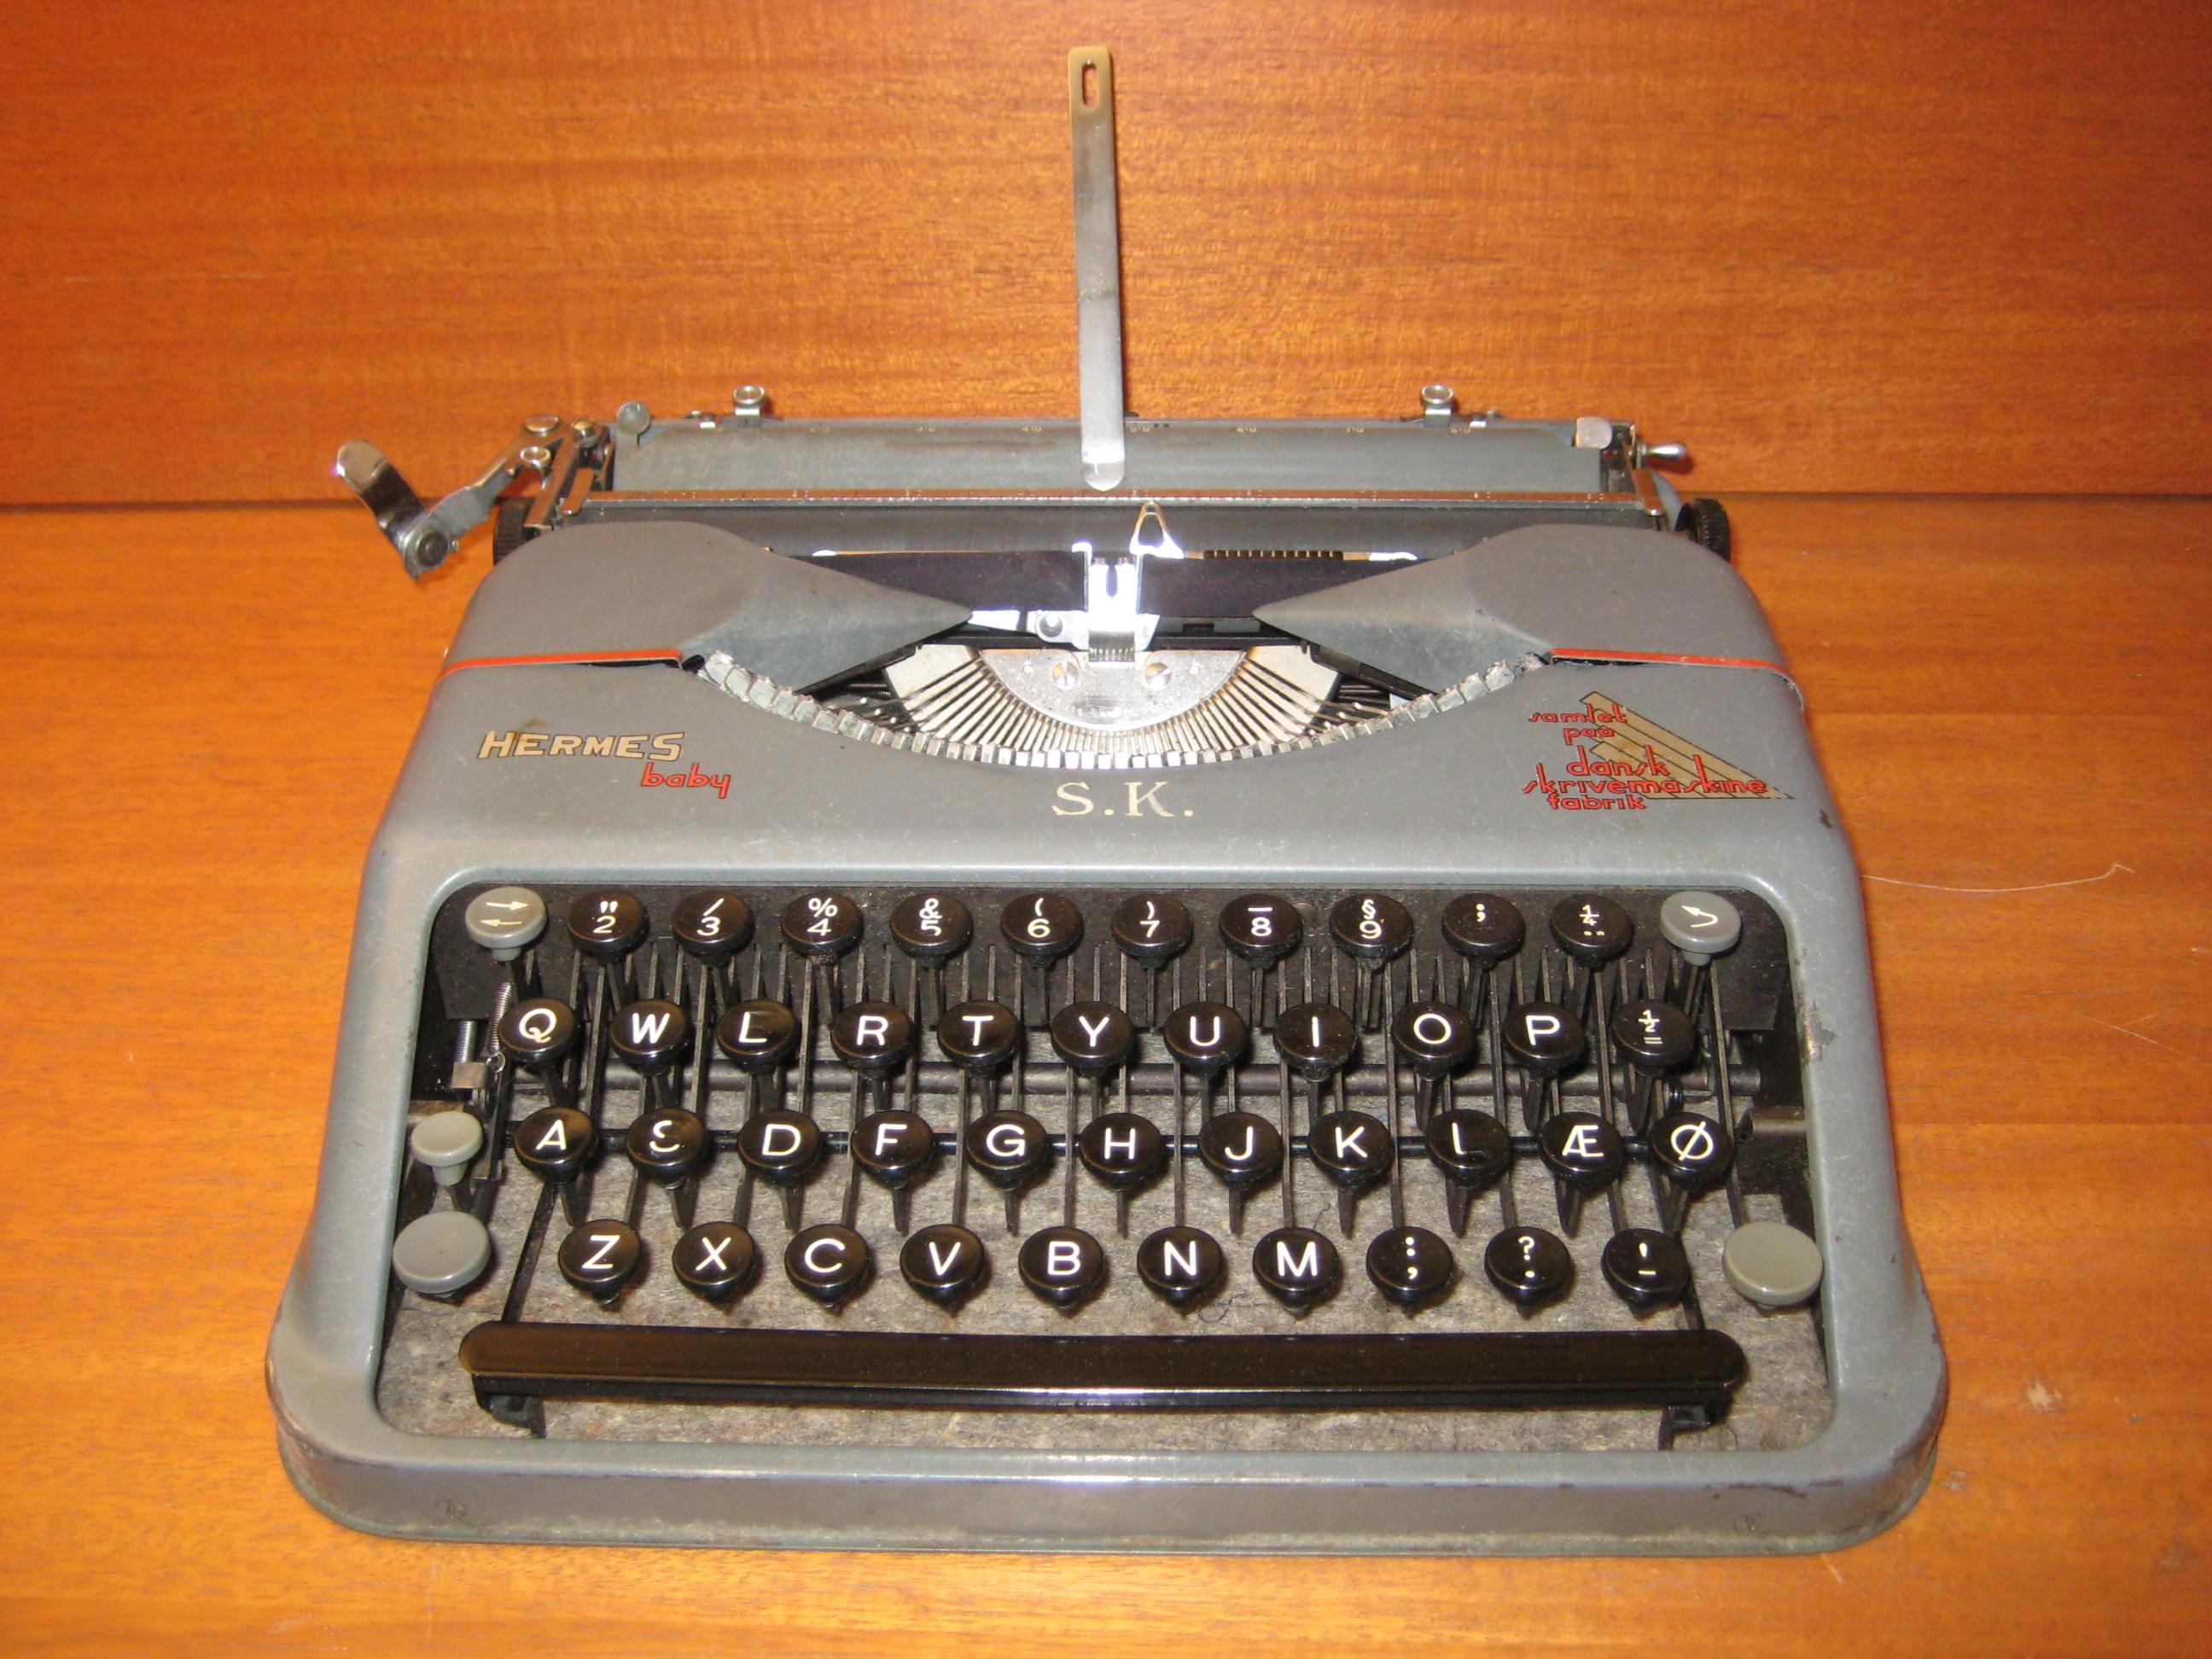 Hermes Baby rejseskrivemaskine